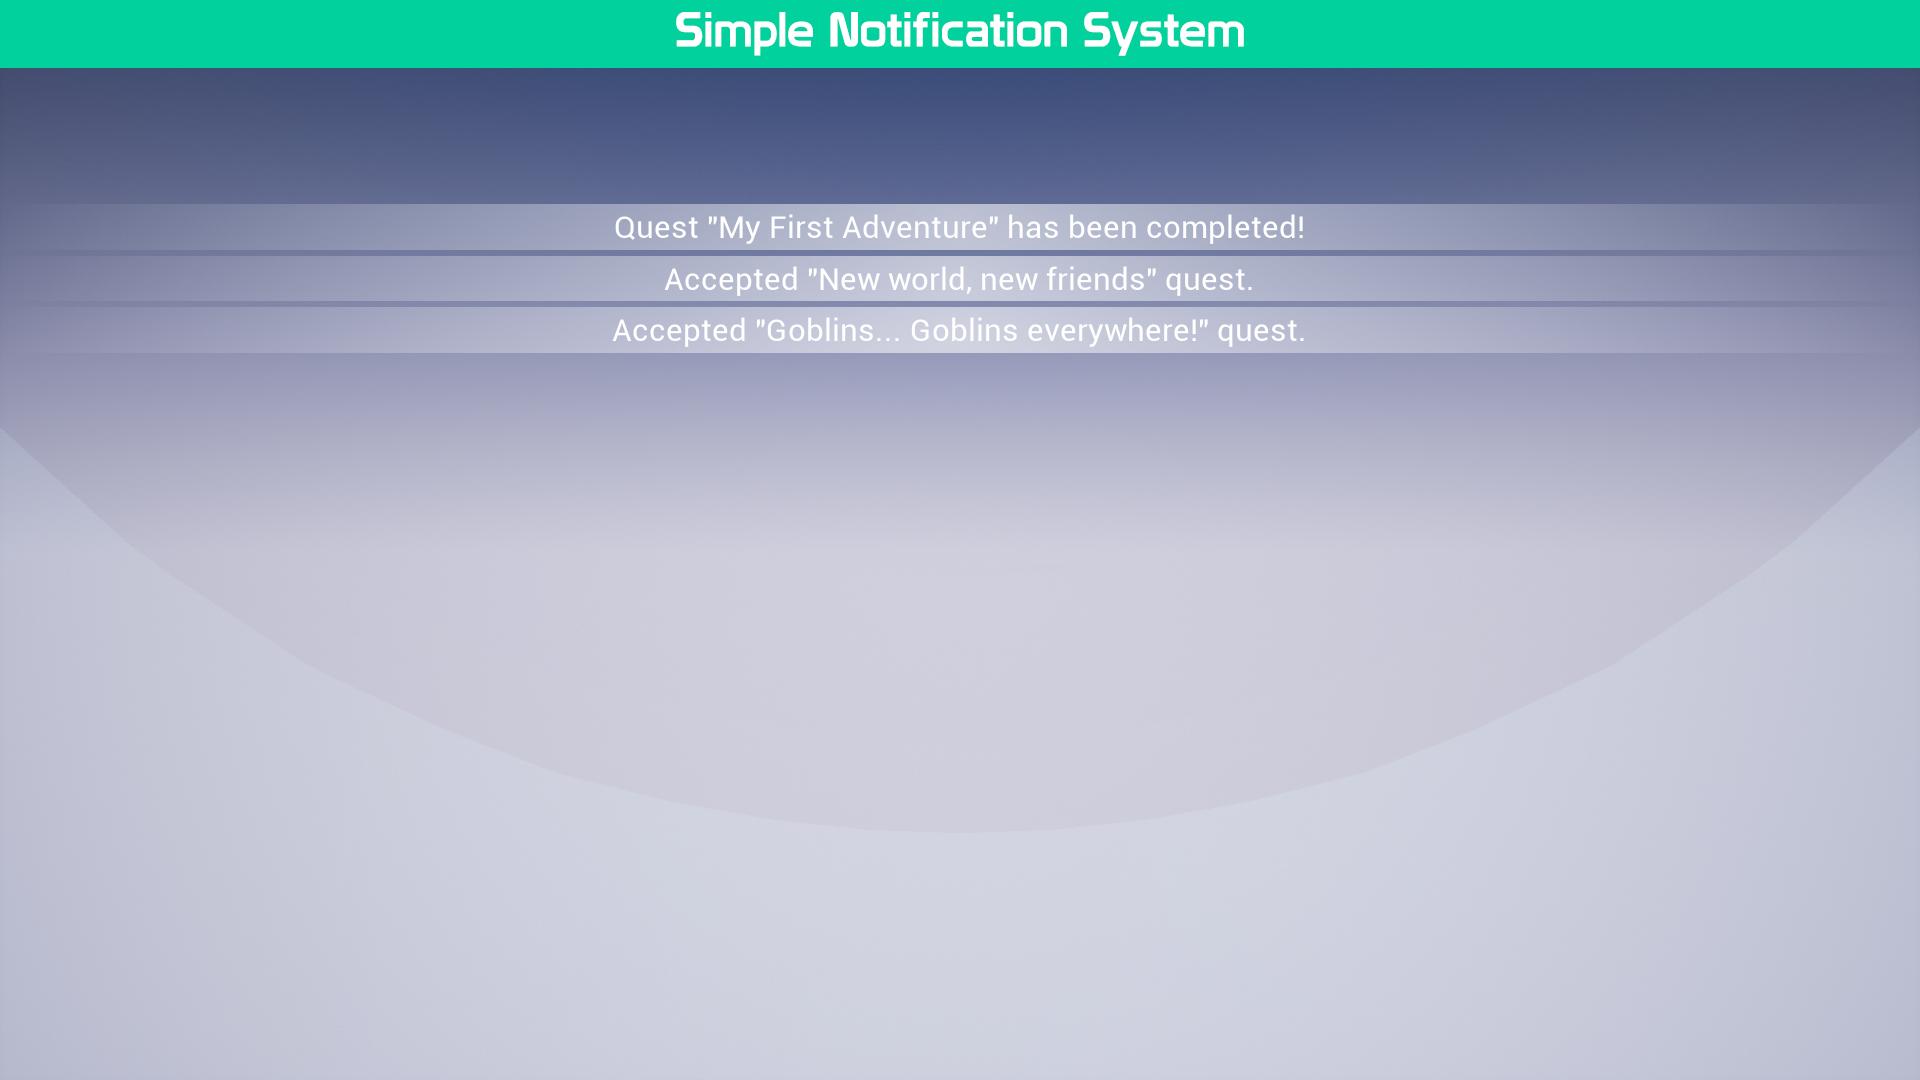 SNSIMG3 1920x1080 386c02078317c95c62afc069aebab18d - Simple Notification System - UE4简单通知系统